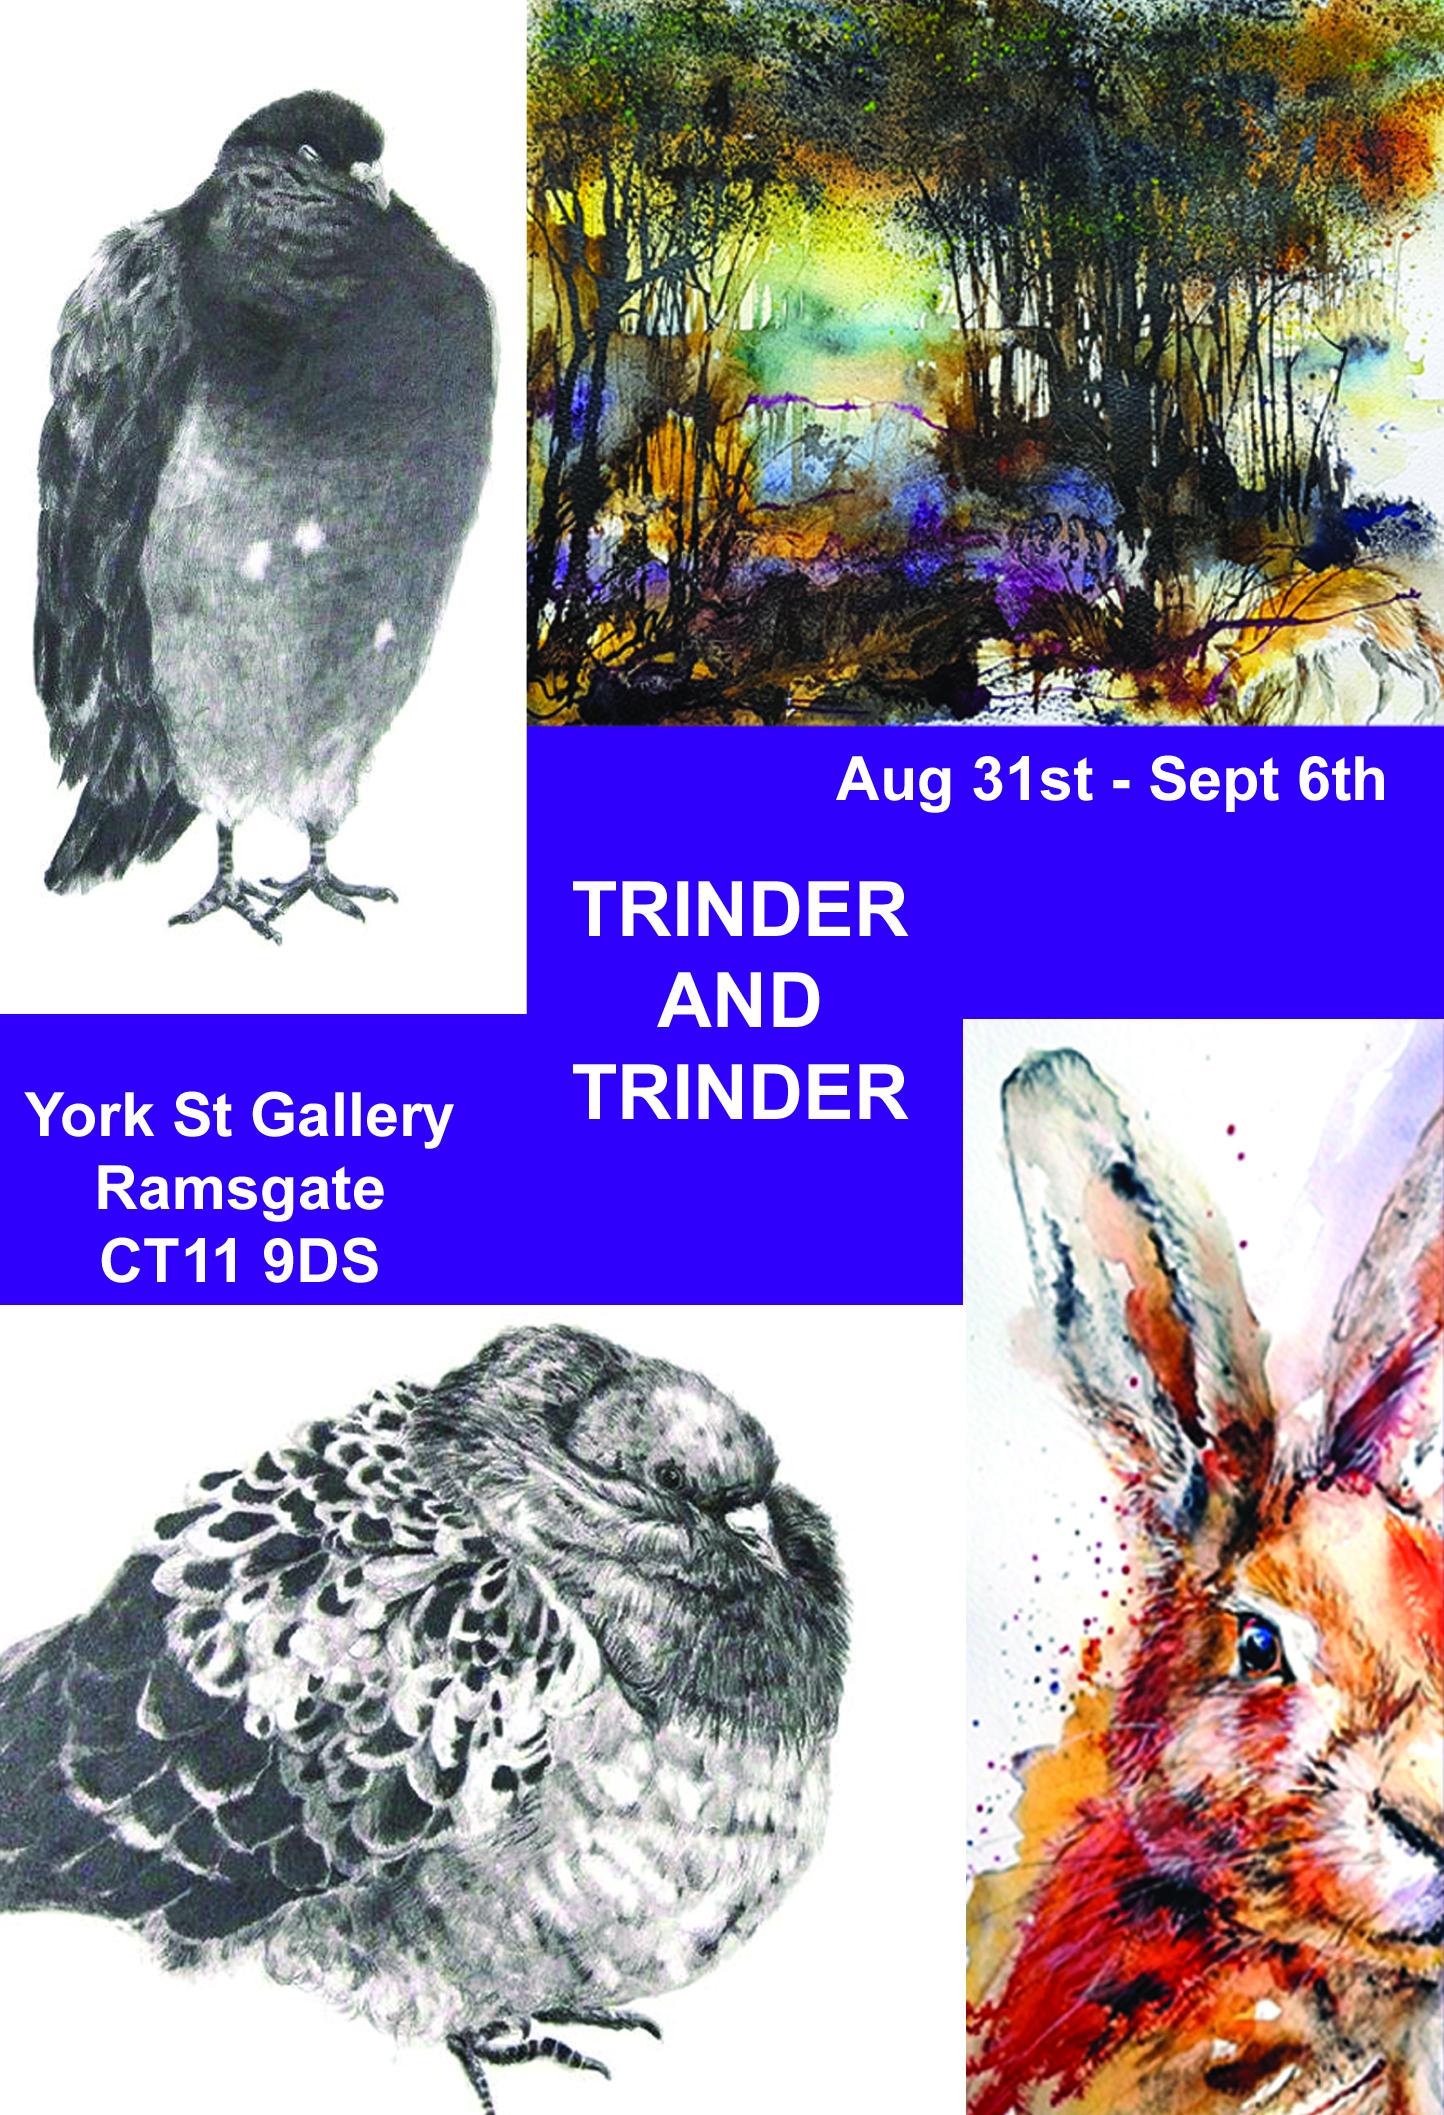 TRINDER AND TRINDER YORK ST